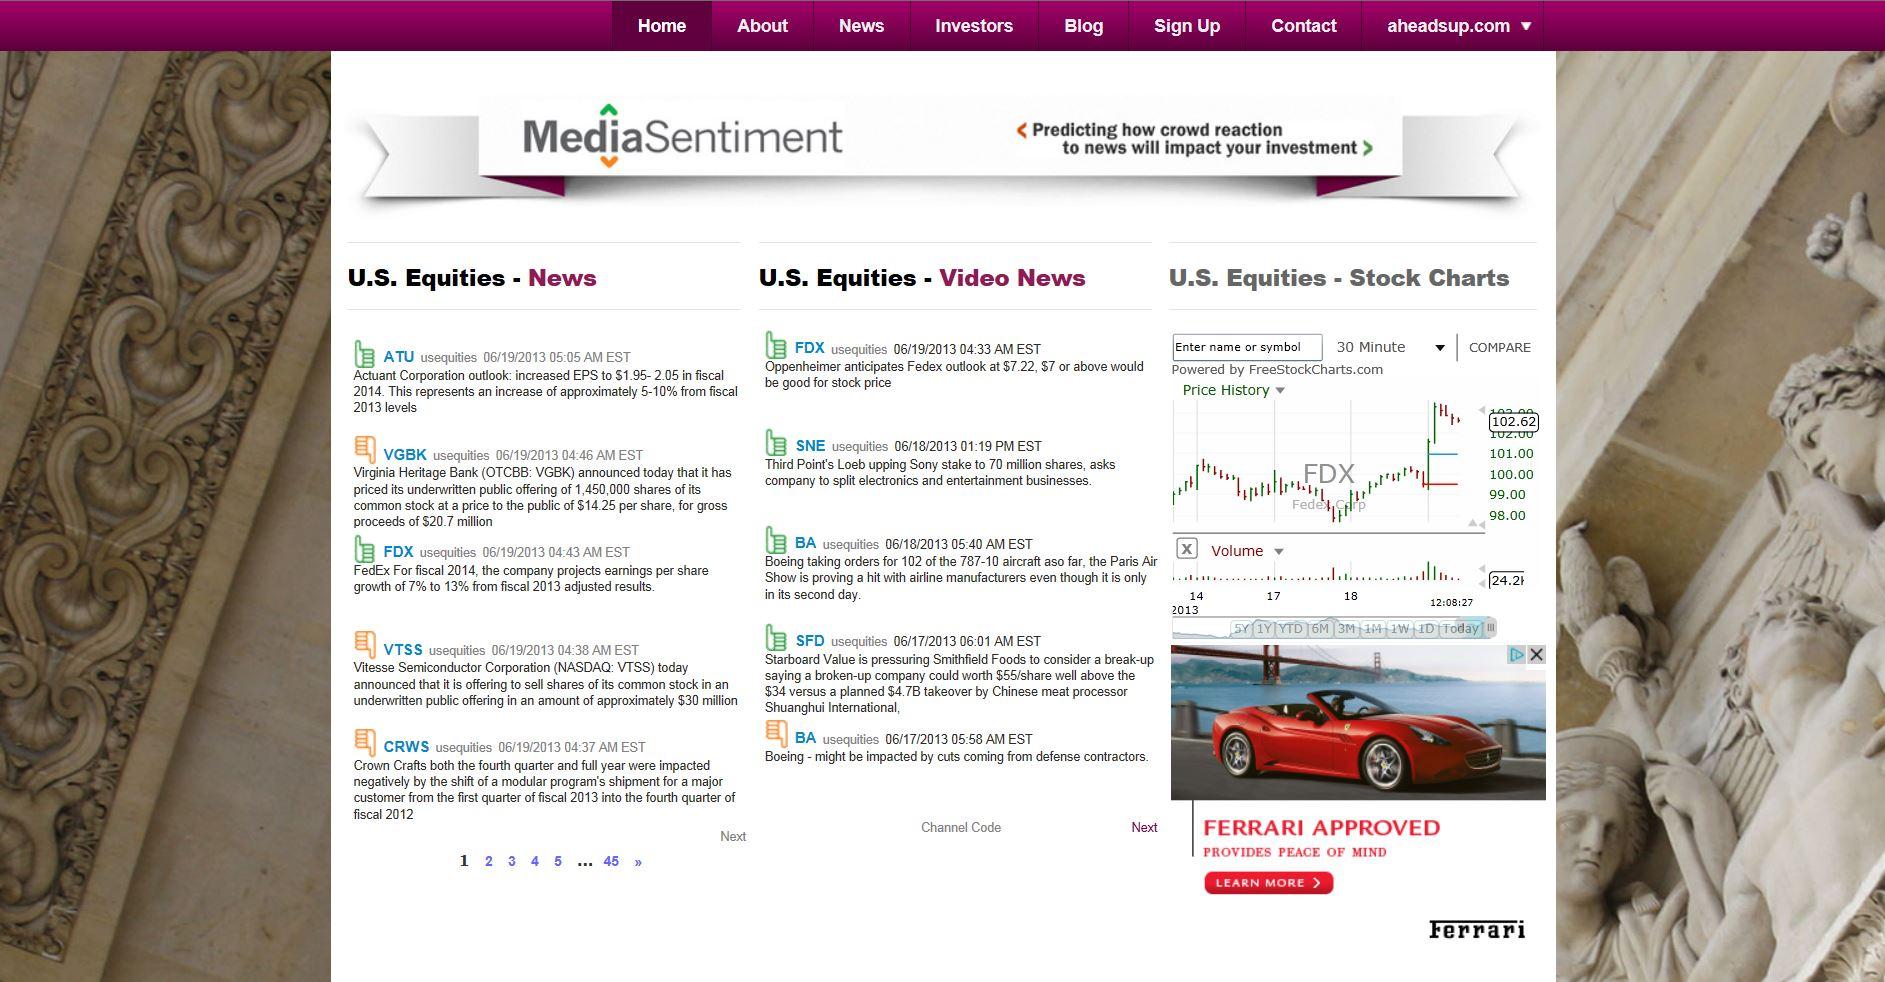 Capture_mediasentiment.com_-_ferrari_ad.JPG